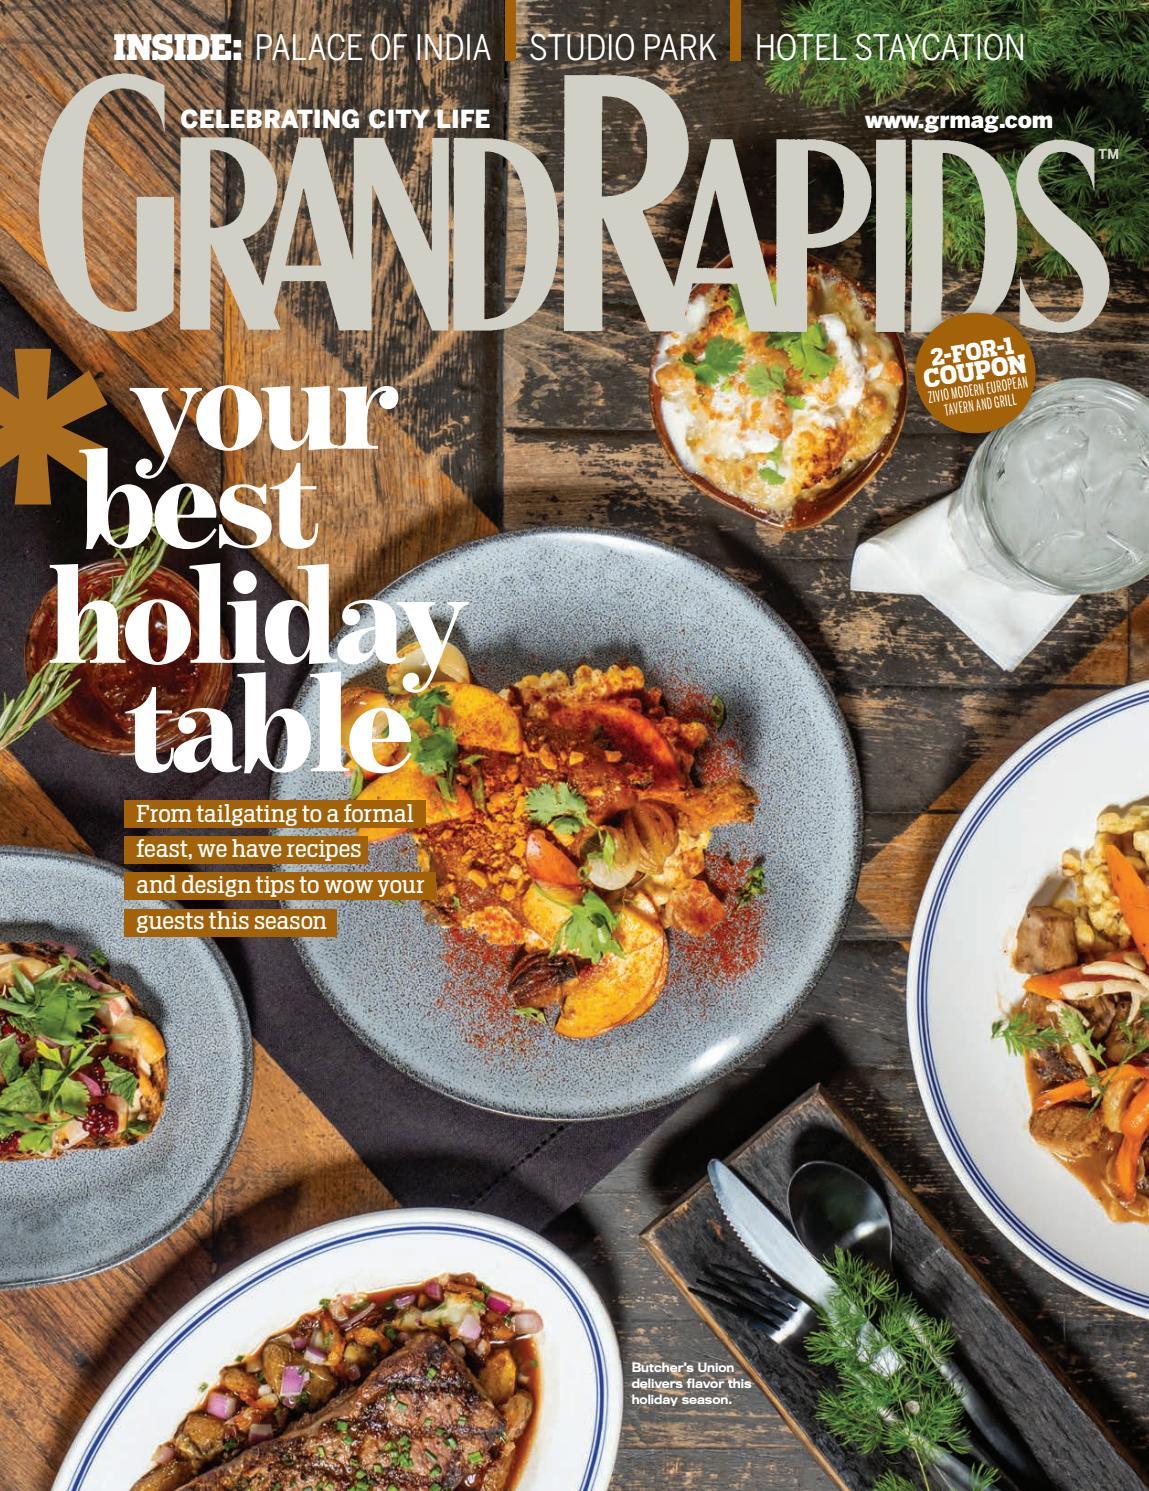 Harmony Cuisine Saint Julien grand rapids magazine - november 2019grand rapids